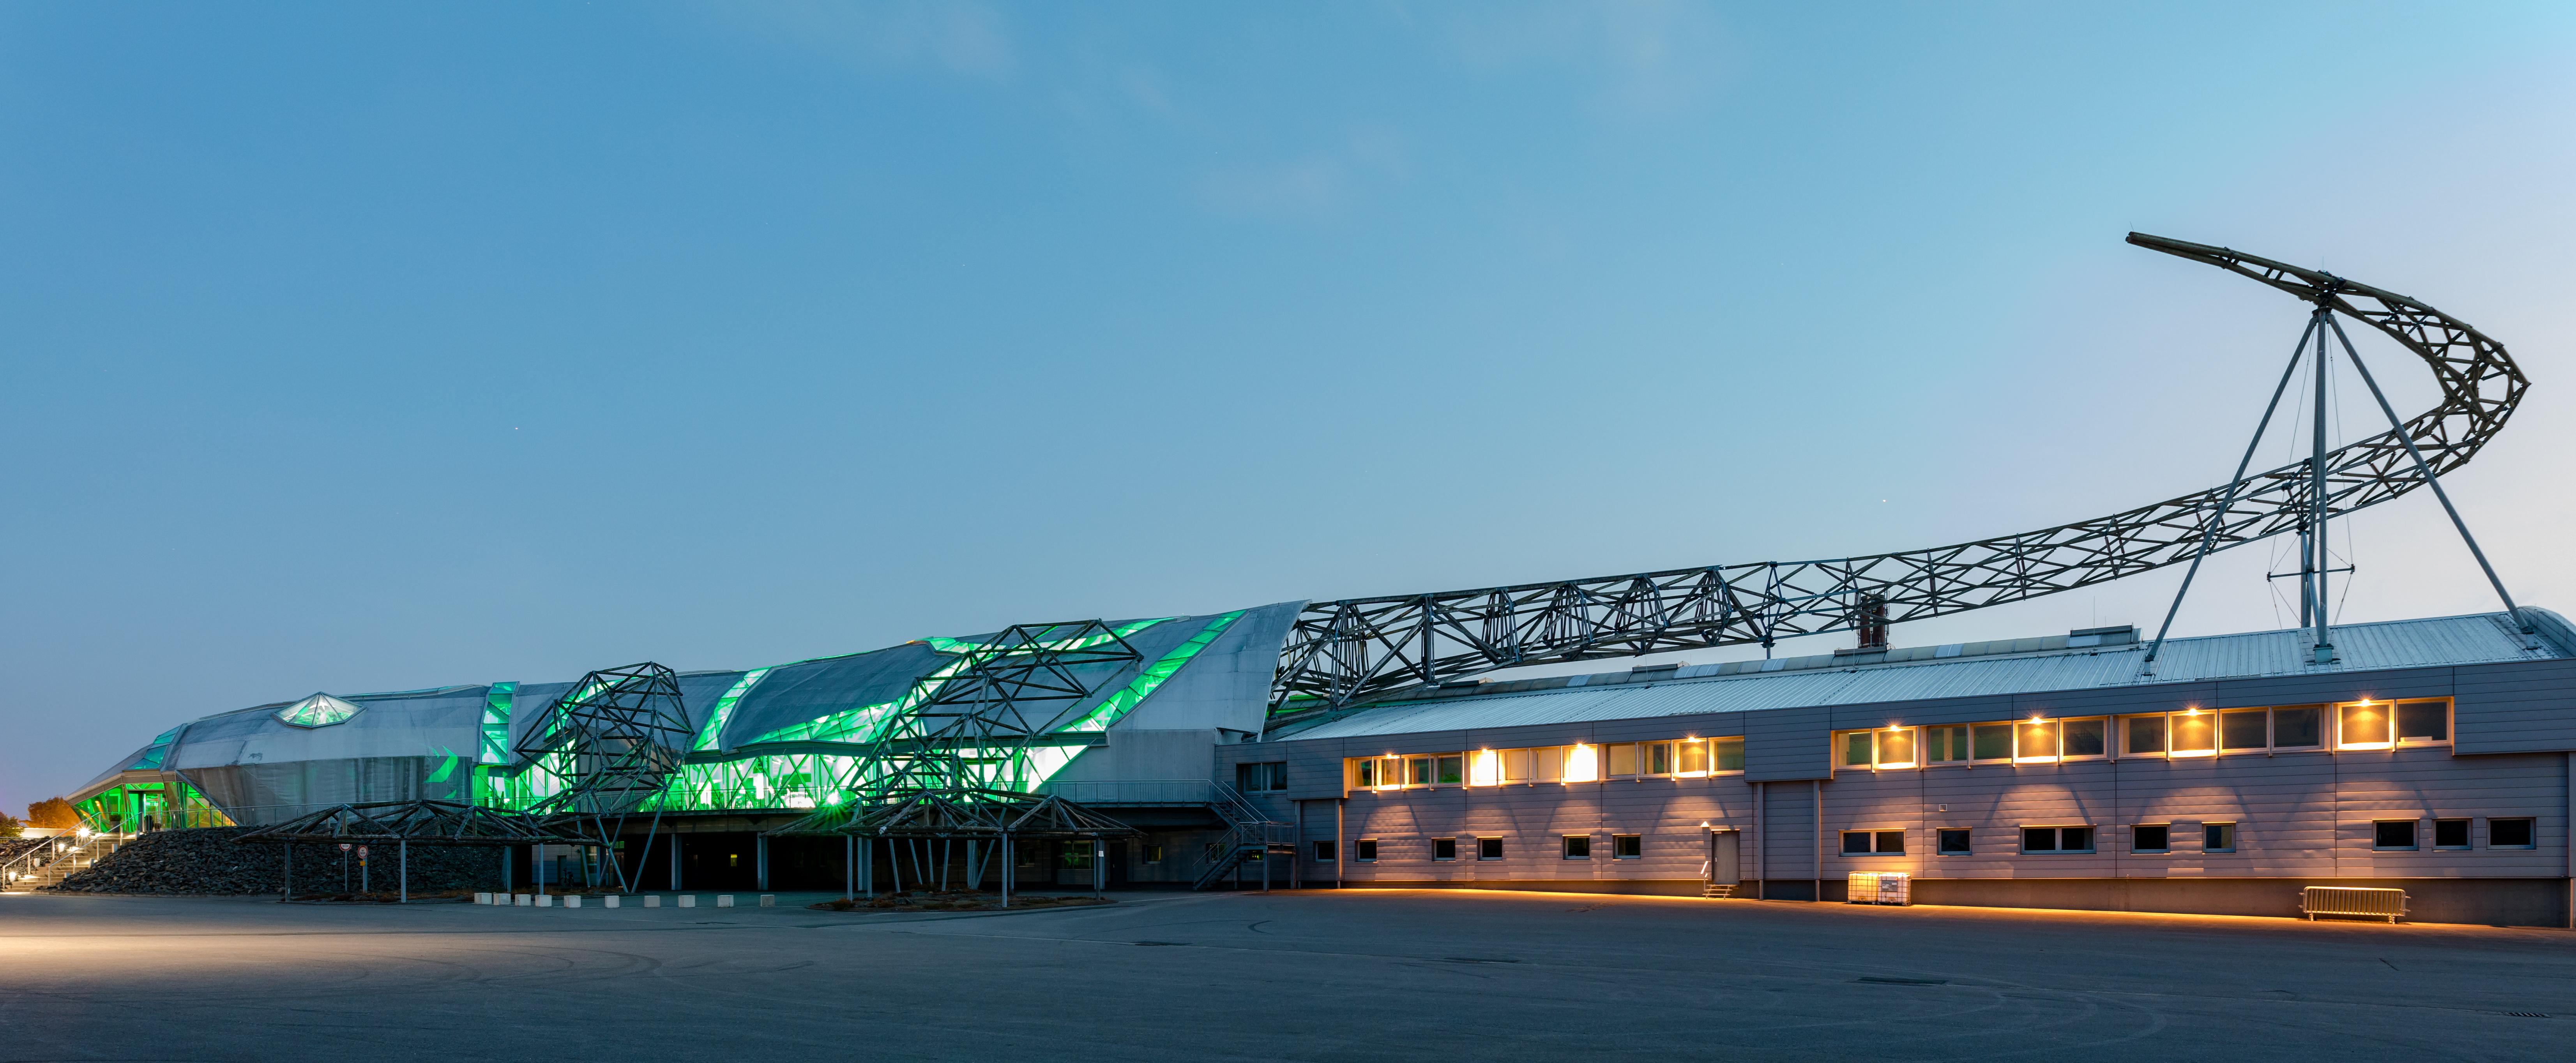 Sports Cars, Dülmen, North Rhine-Westphalia, Germany (2018) German Vorbereitungen zum Open-Air-Konzert des Dülmener Sommers bei Wiesmann Sports Cars, Dülmen